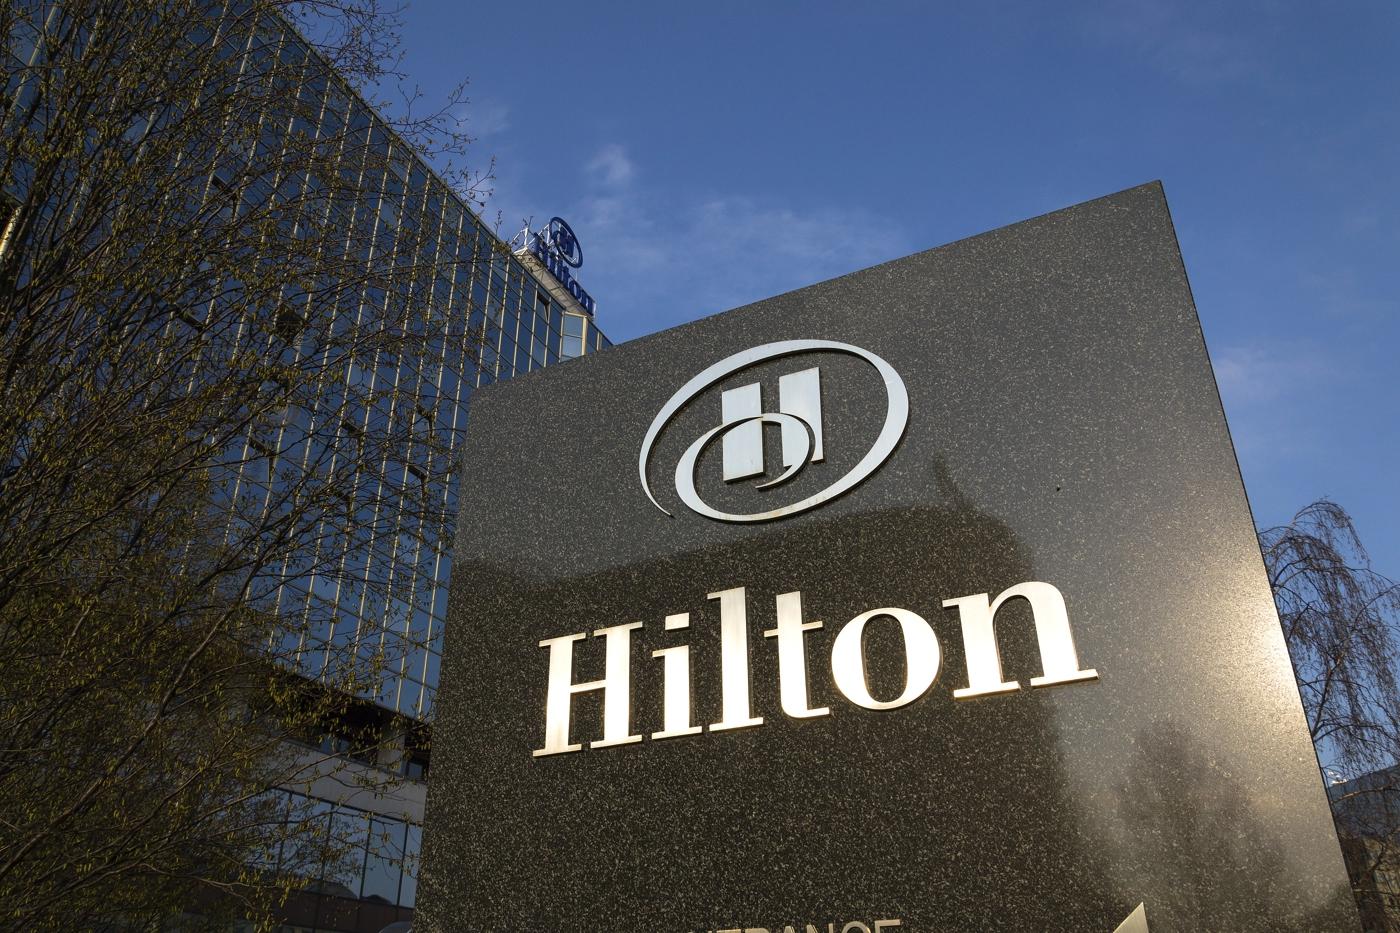 Hilton Hotels HLT stock